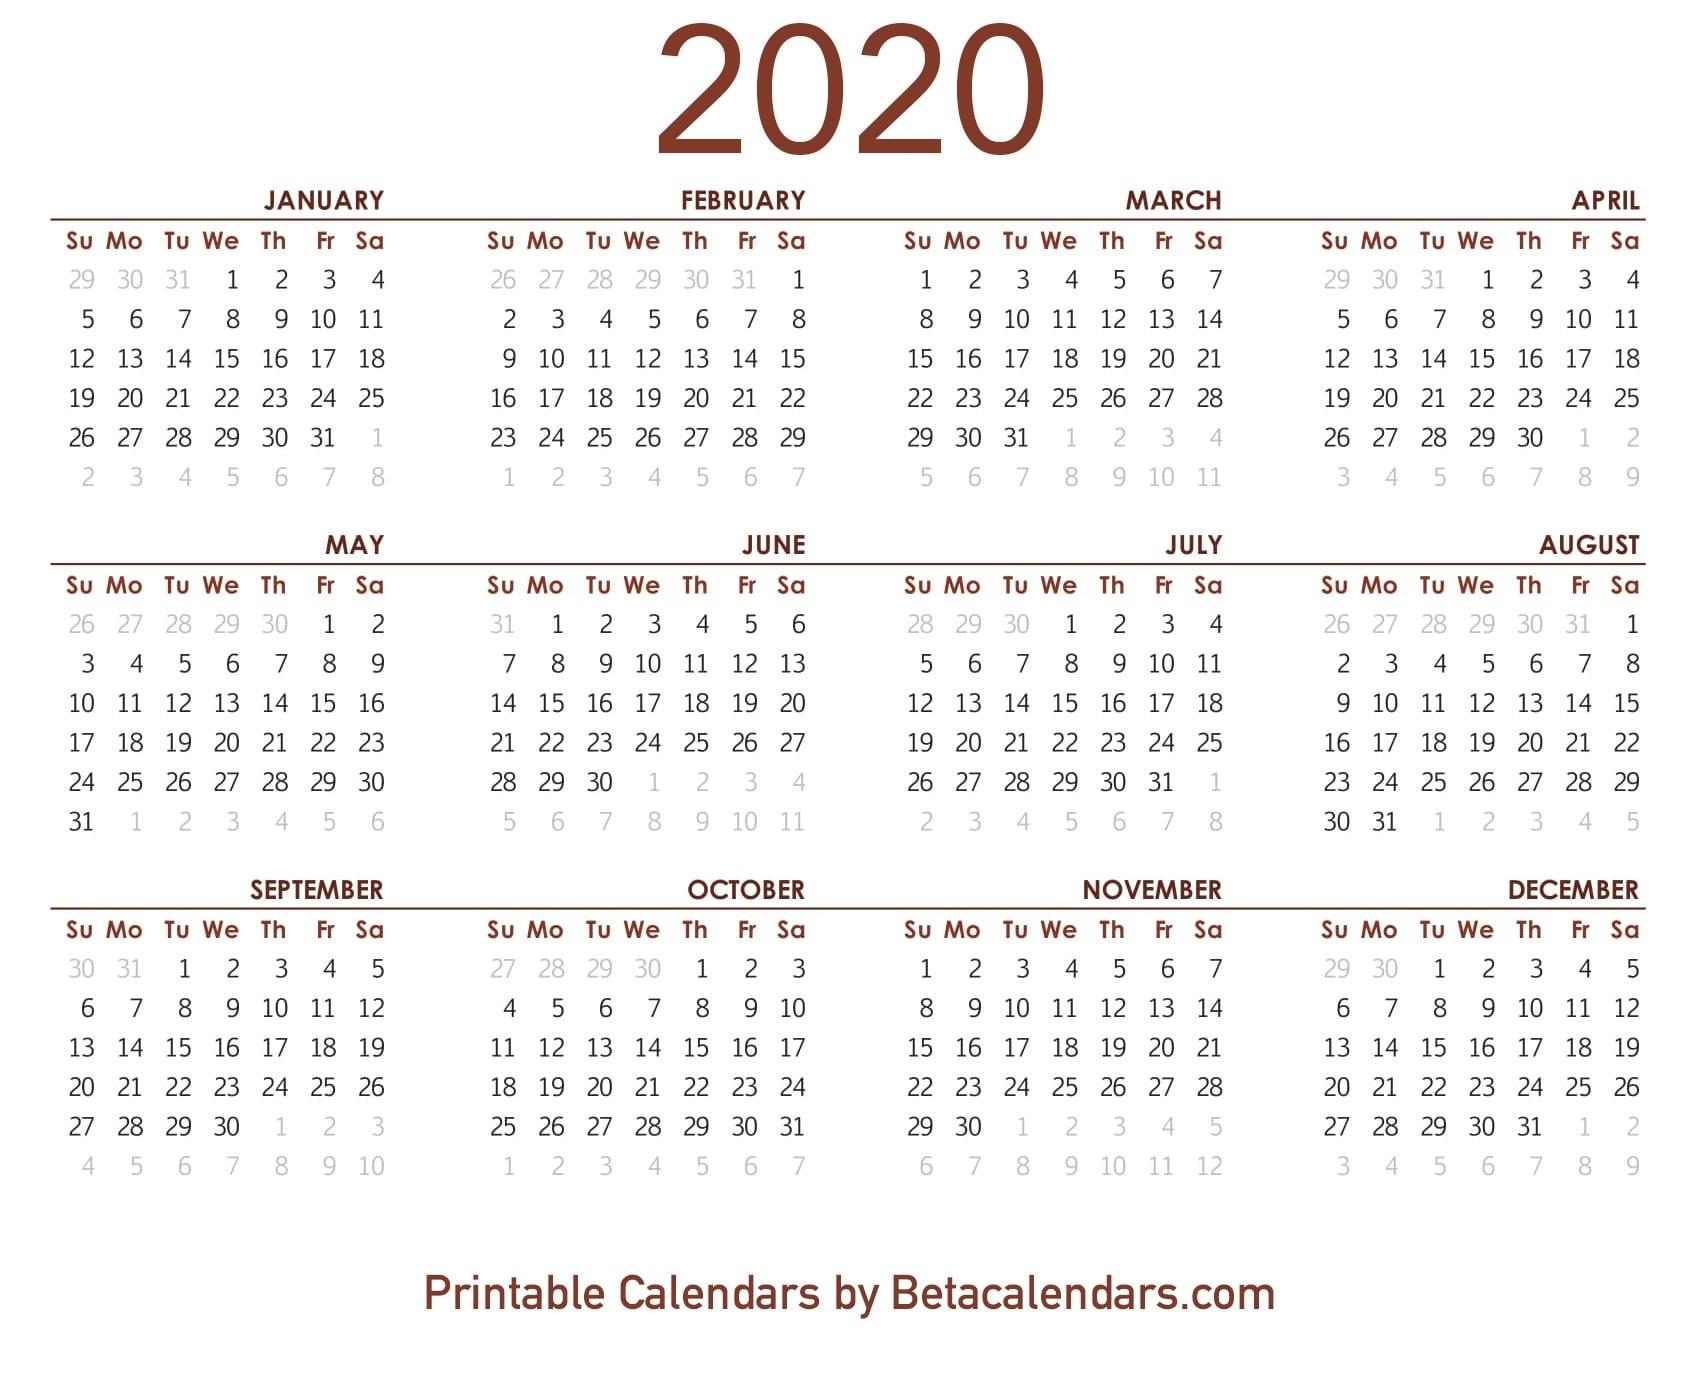 2020 Calendar - Free Printable Yearly Calendar 2020 Extraordinary 2020 Yearly Calendar Printable